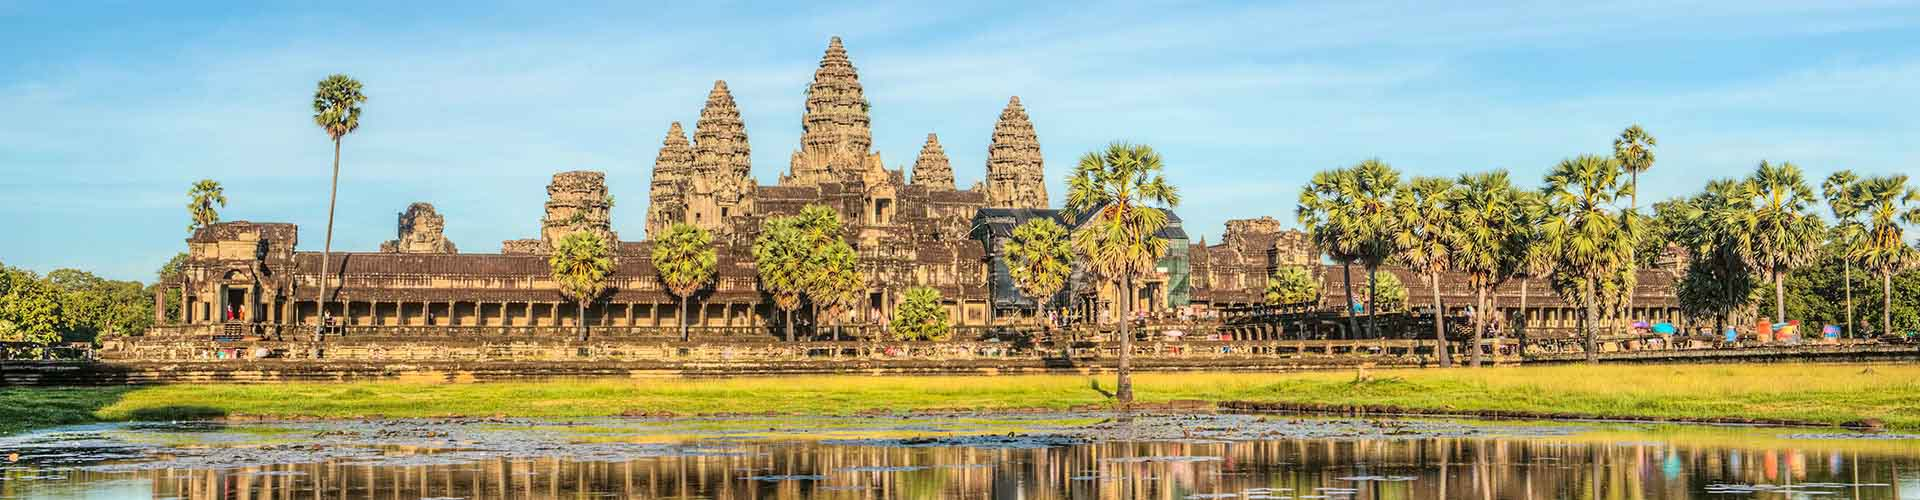 Siem Reap – Hostellit kohteessa Siem Reap. Siem Reap -karttoja, valokuvia ja arvosteluja kaikista Siem Reap -hostelleista.